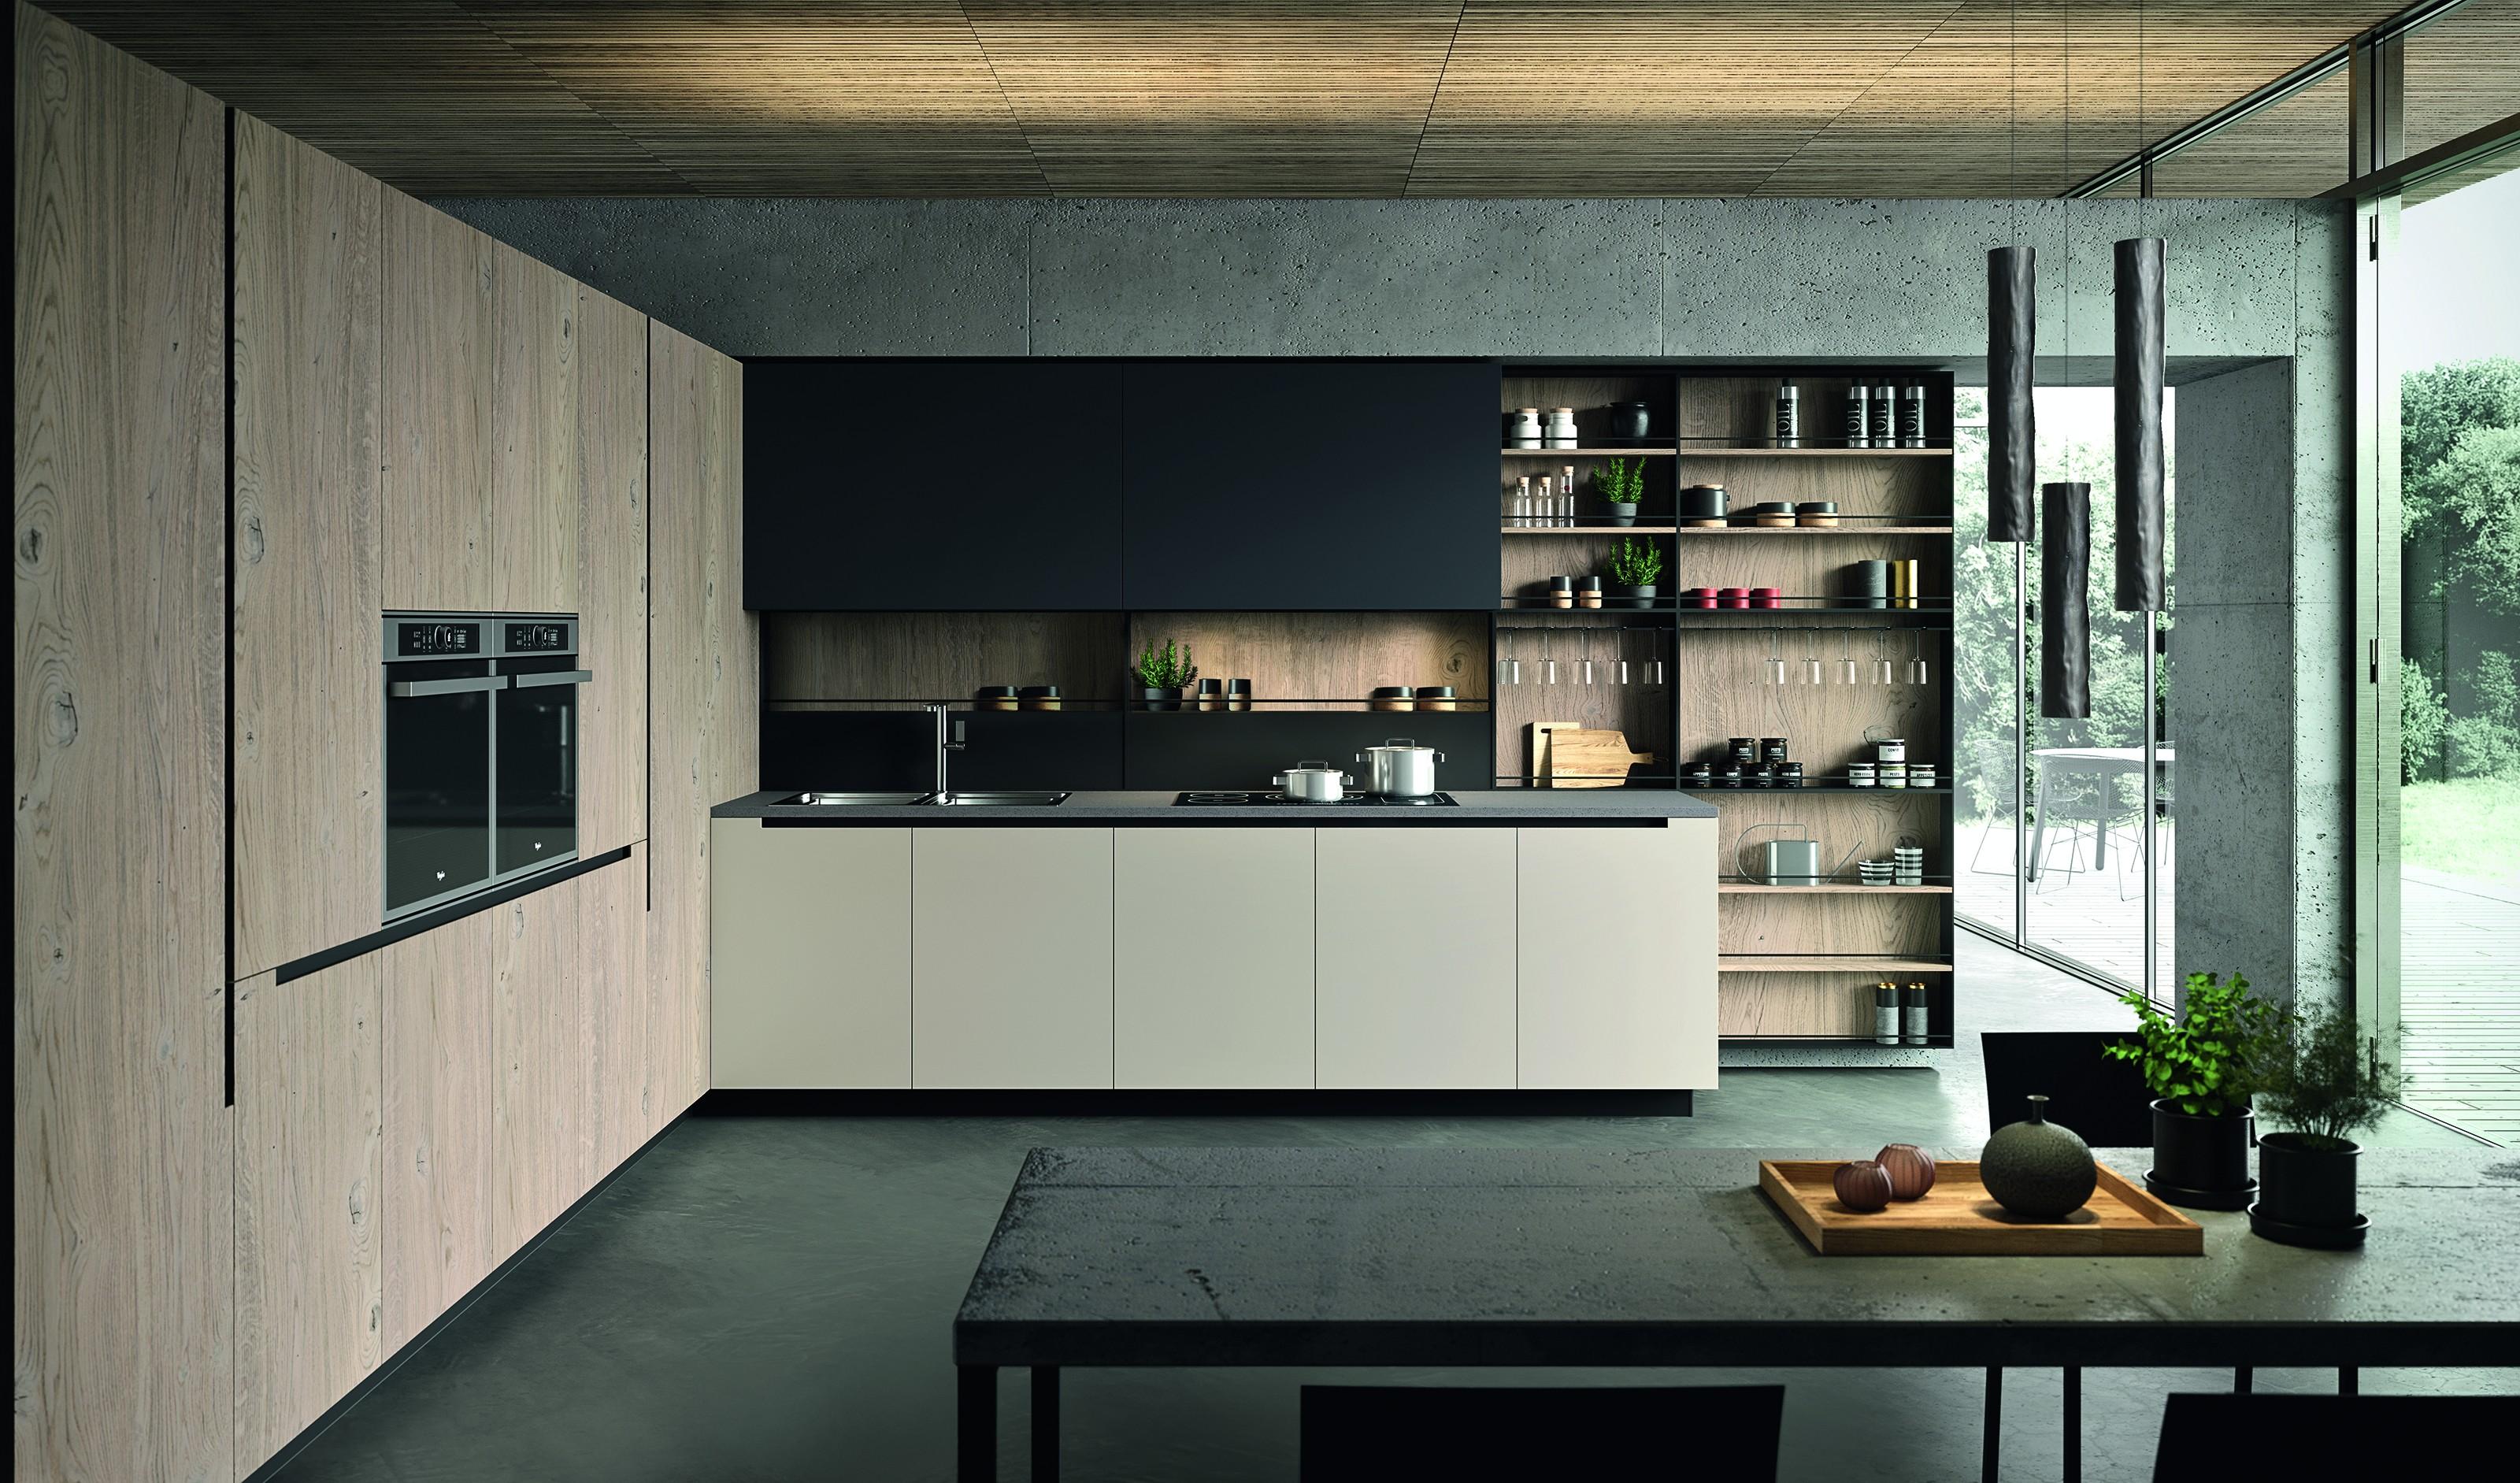 Aran kitchen world cover image